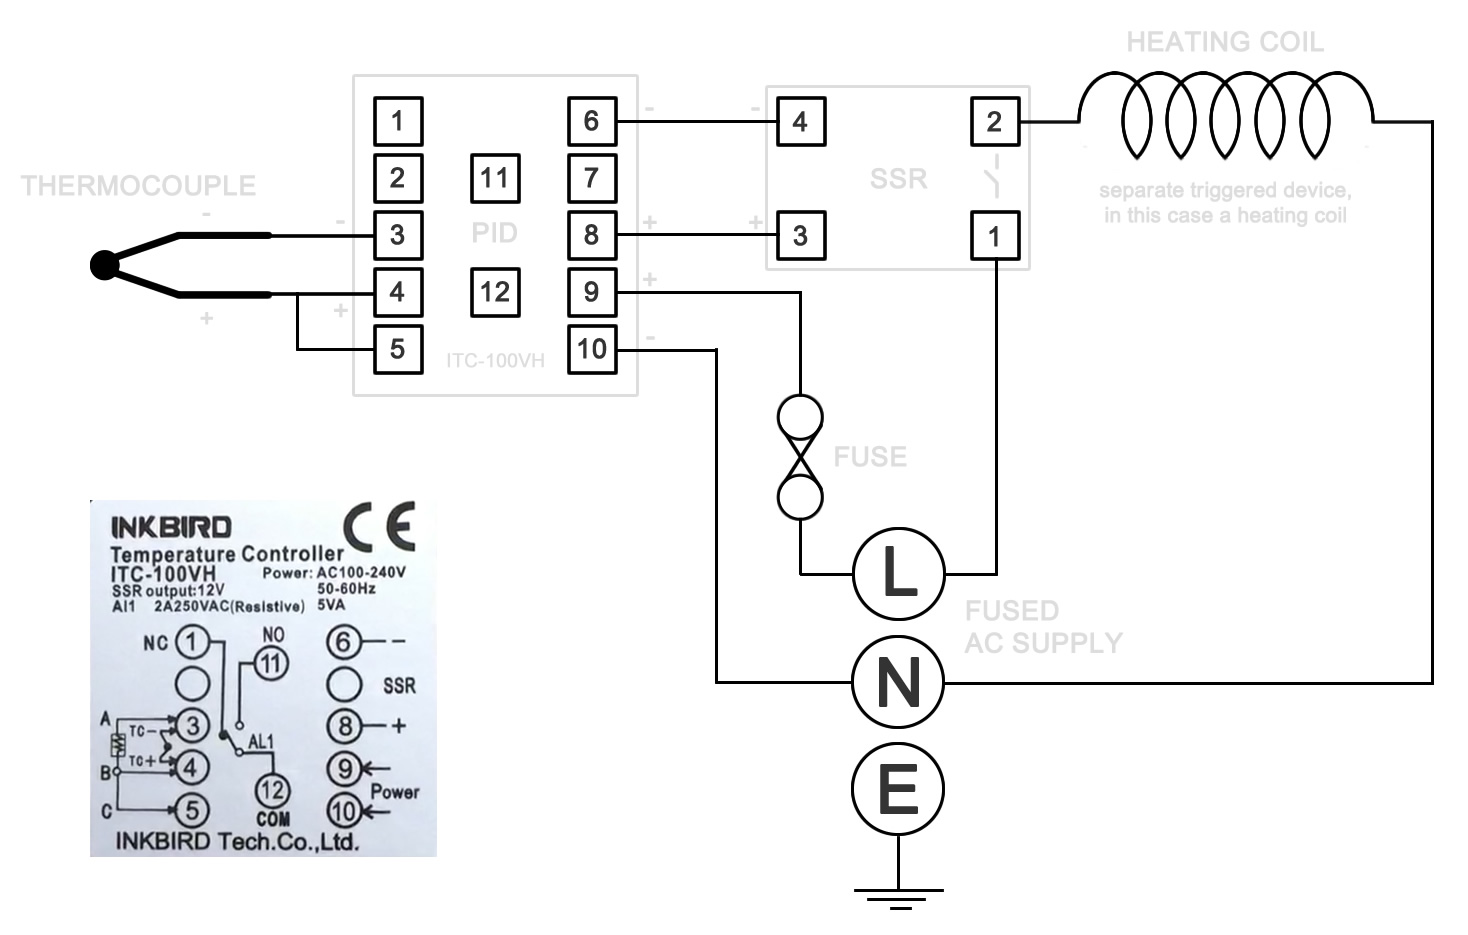 Astounding Pid Wiring Diagram 220V Wiring Diagram Wiring Cloud Waroletkolfr09Org